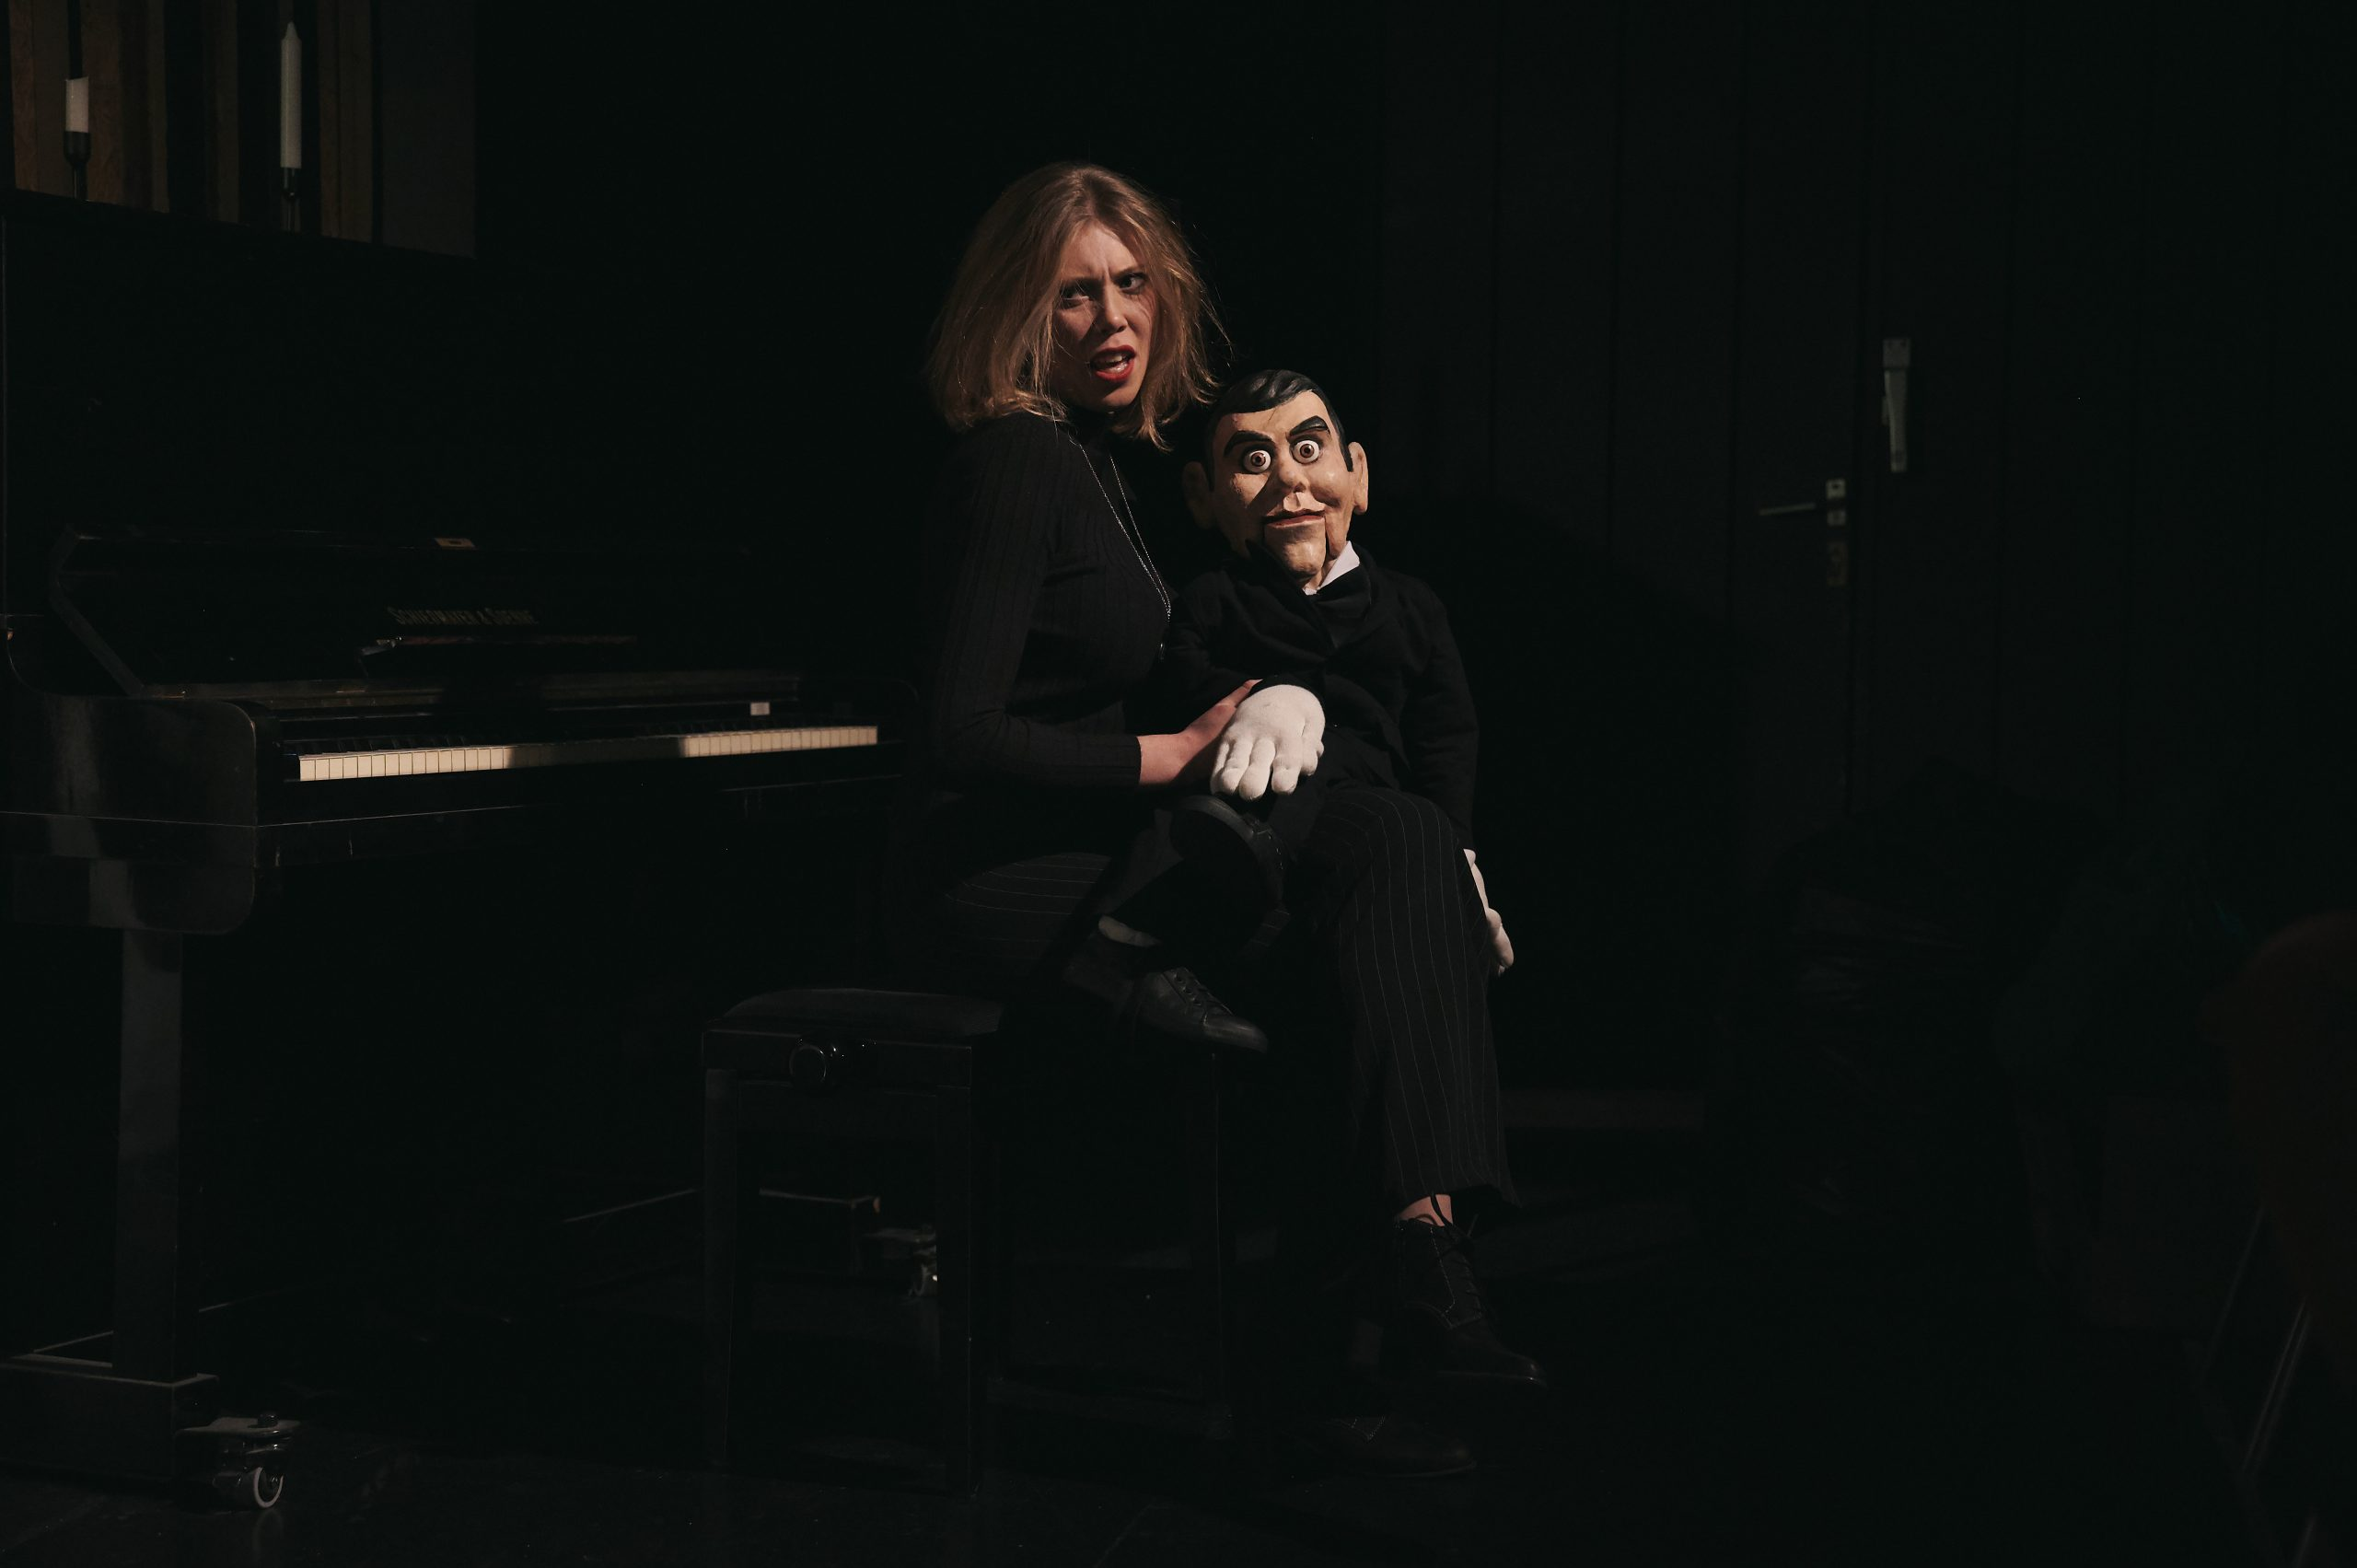 Cynthia Ruf Photography Fotografie Jakobus Theater Schauspieler Drama